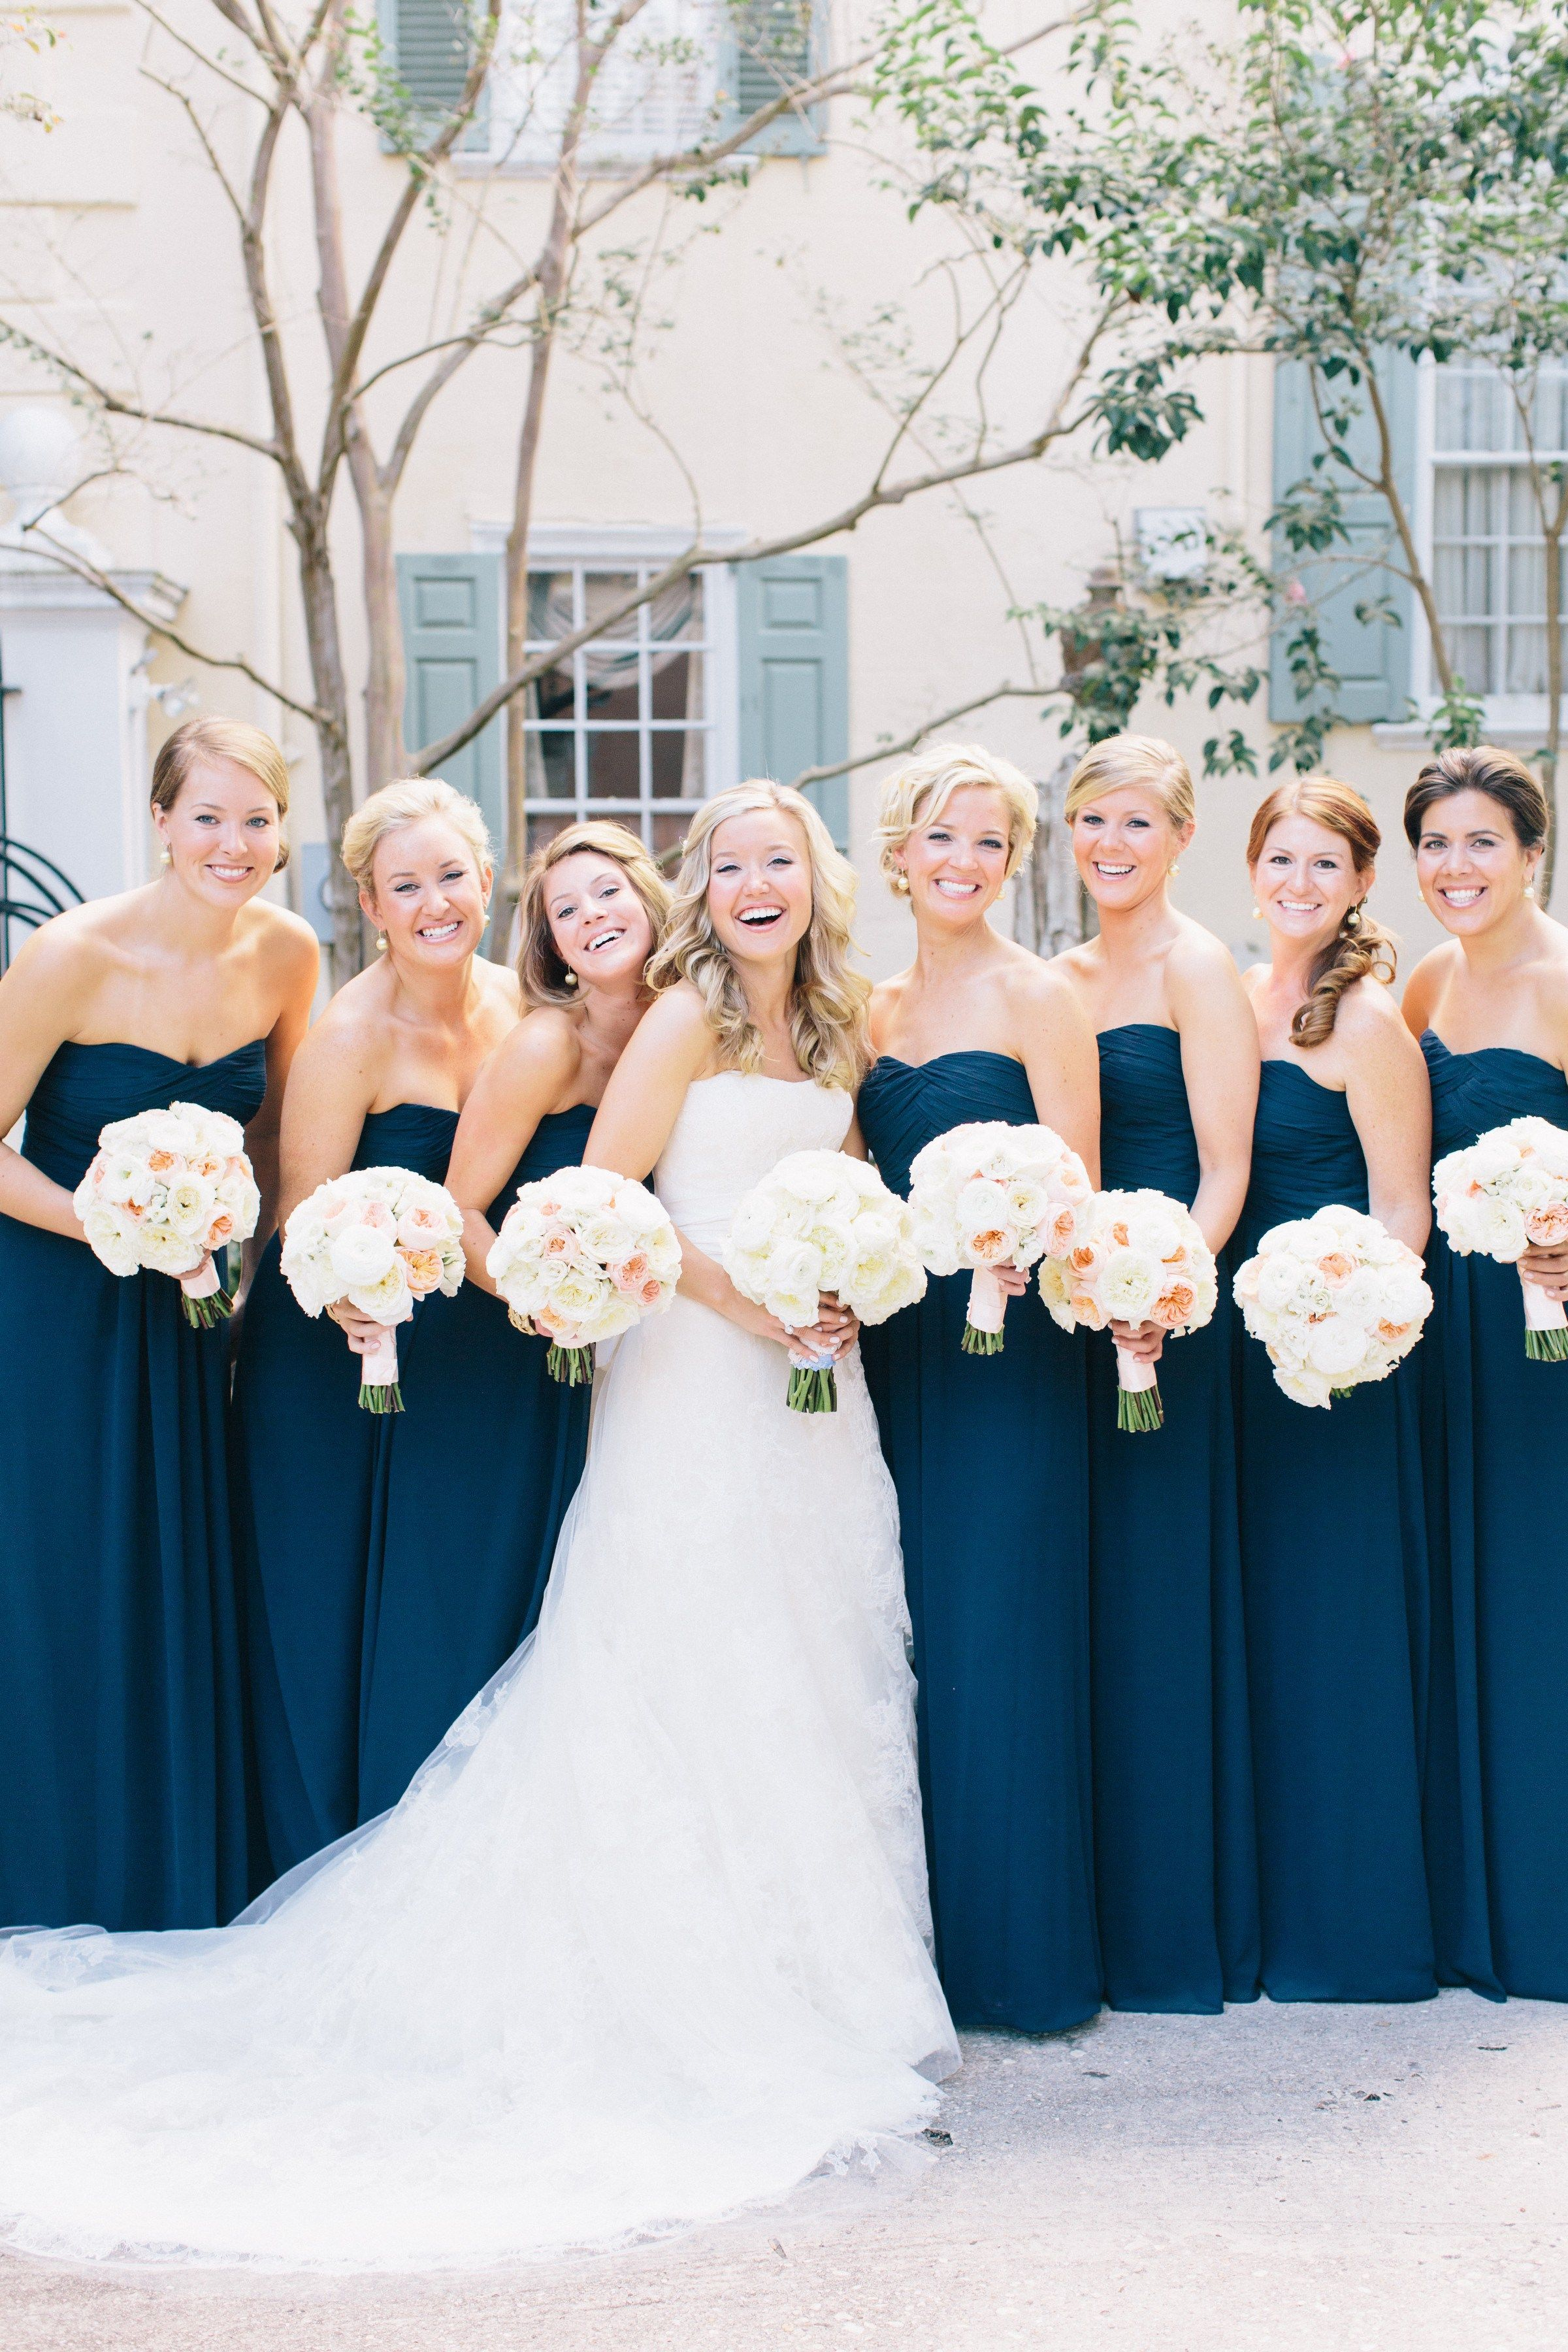 448ffb818b881 Winter Bouquet Blue Bridesmaid Dresses - Fresh Winter Bouquet Blue  Bridesmaid Dresses, Winter Wedding Blue Bridesmaid Dresses Naf Dresses